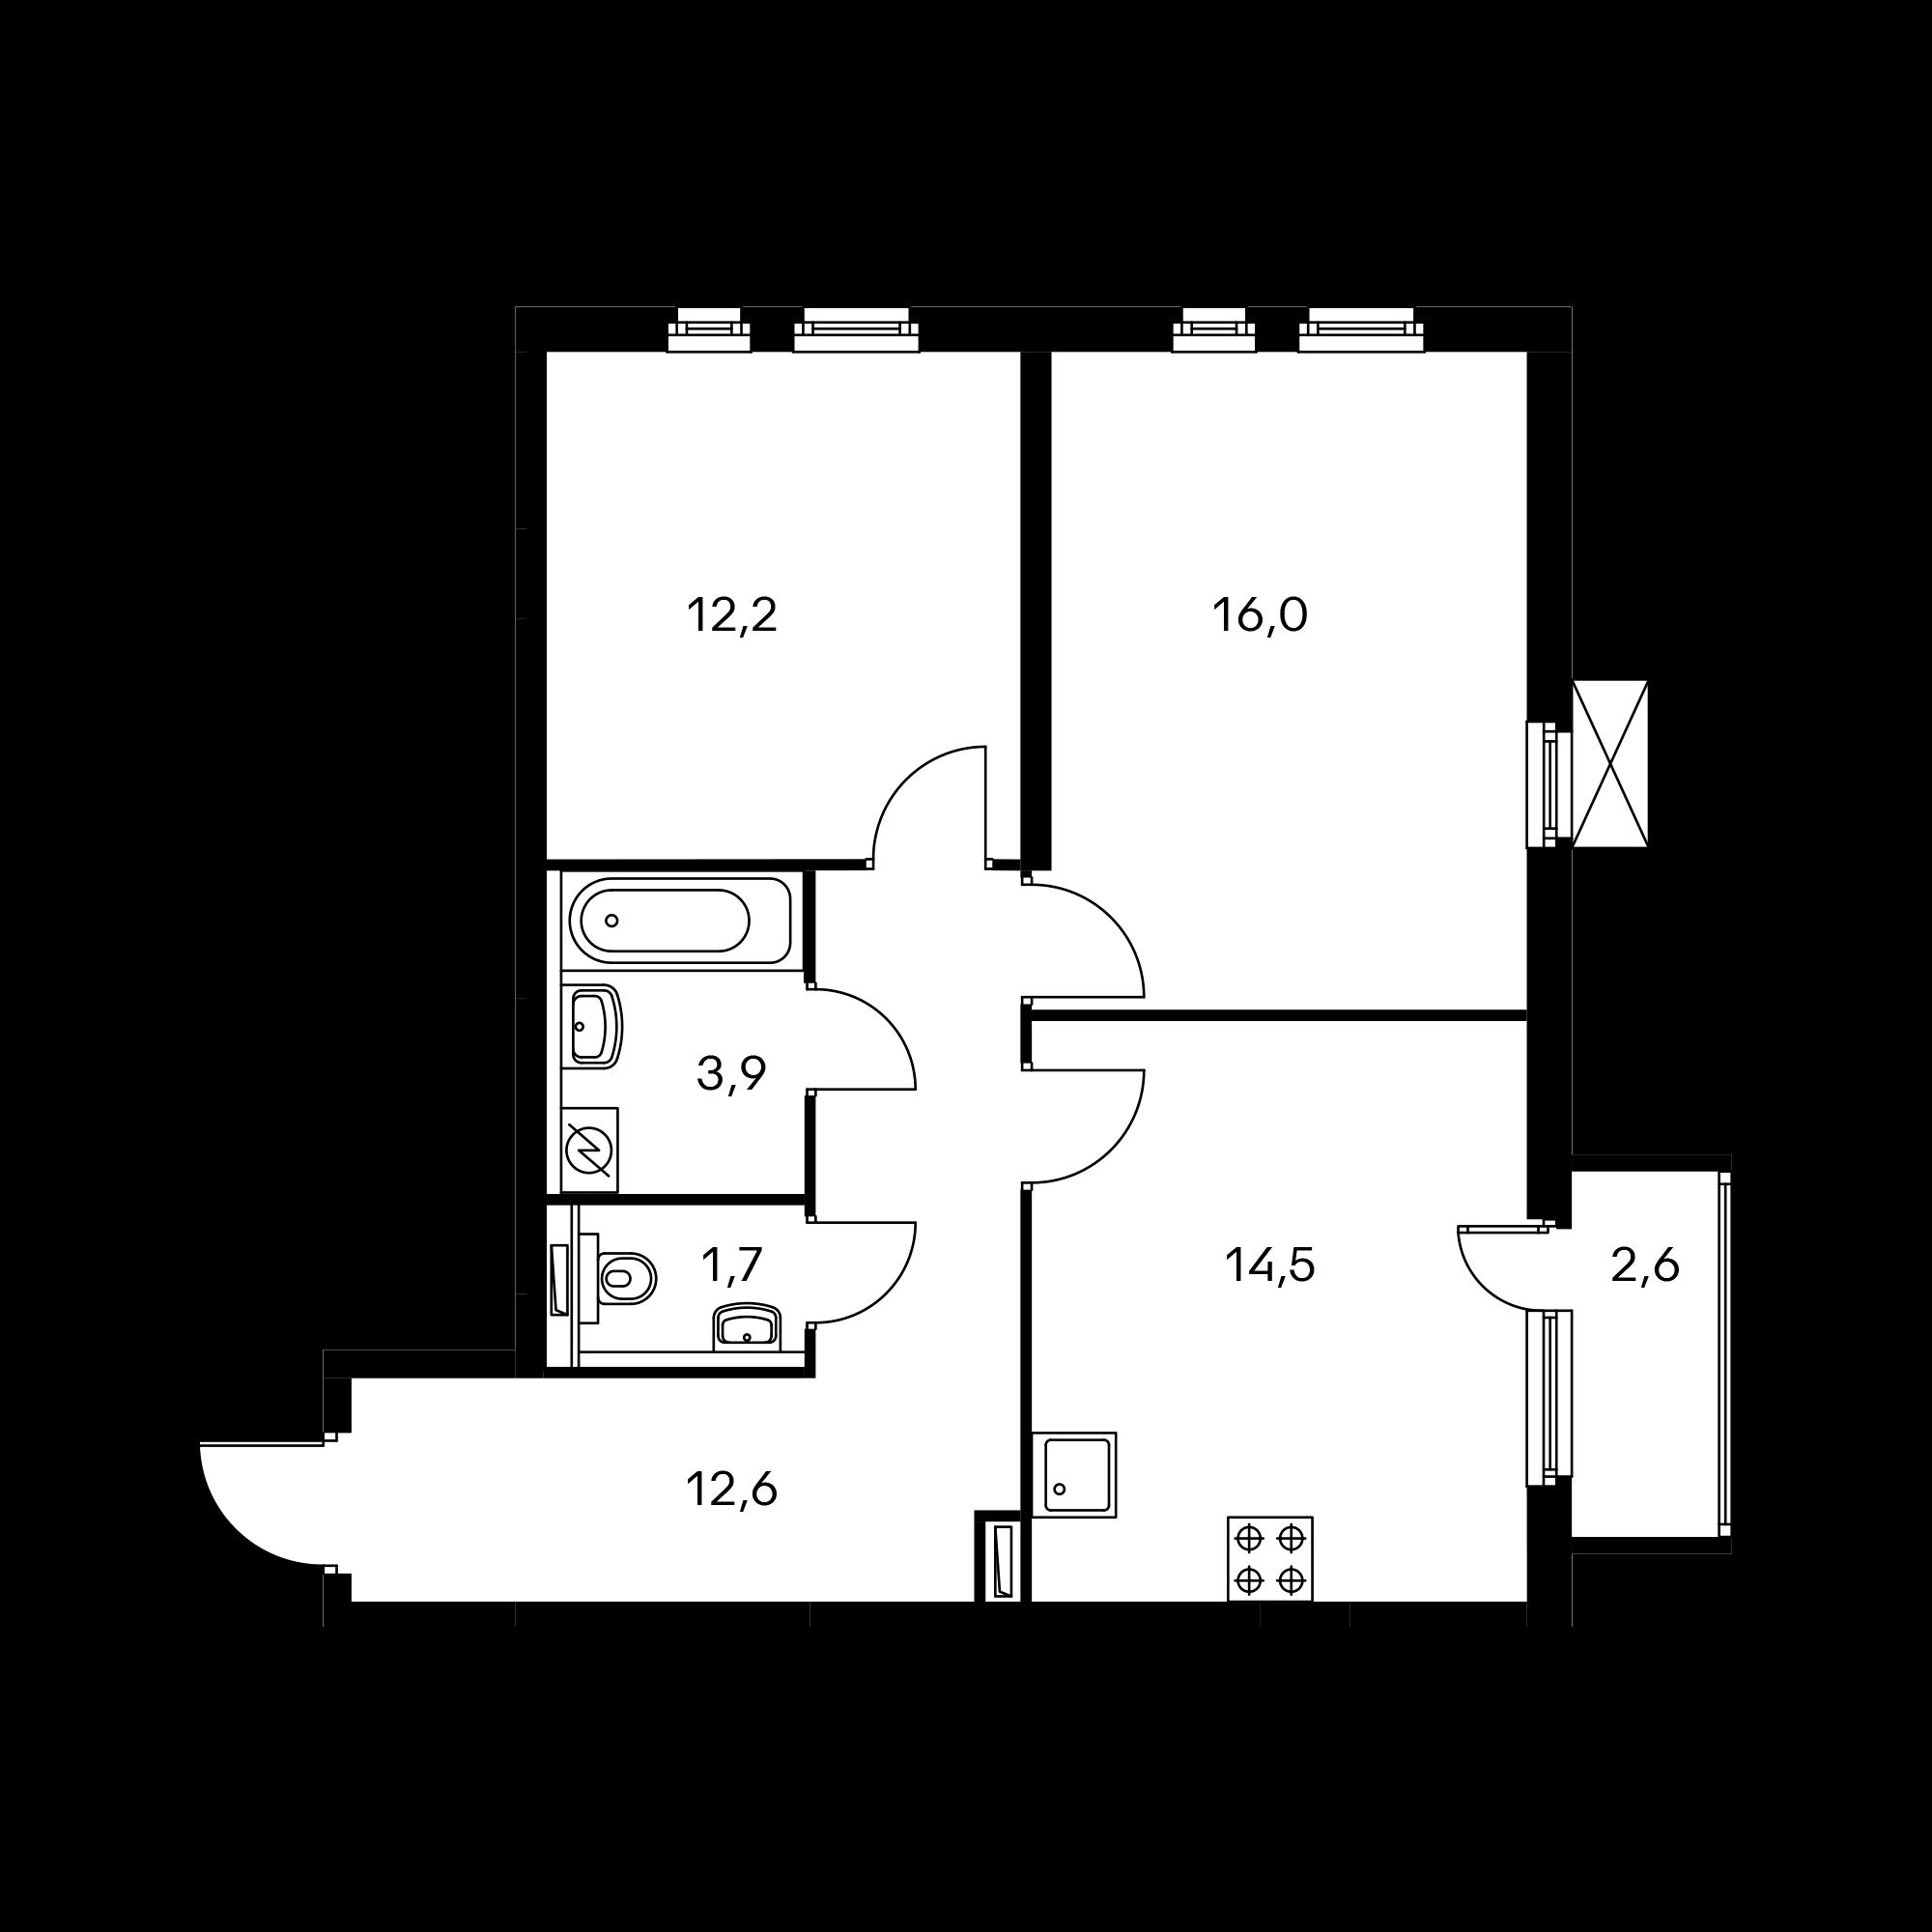 2KM1B-9.9-1SZ1